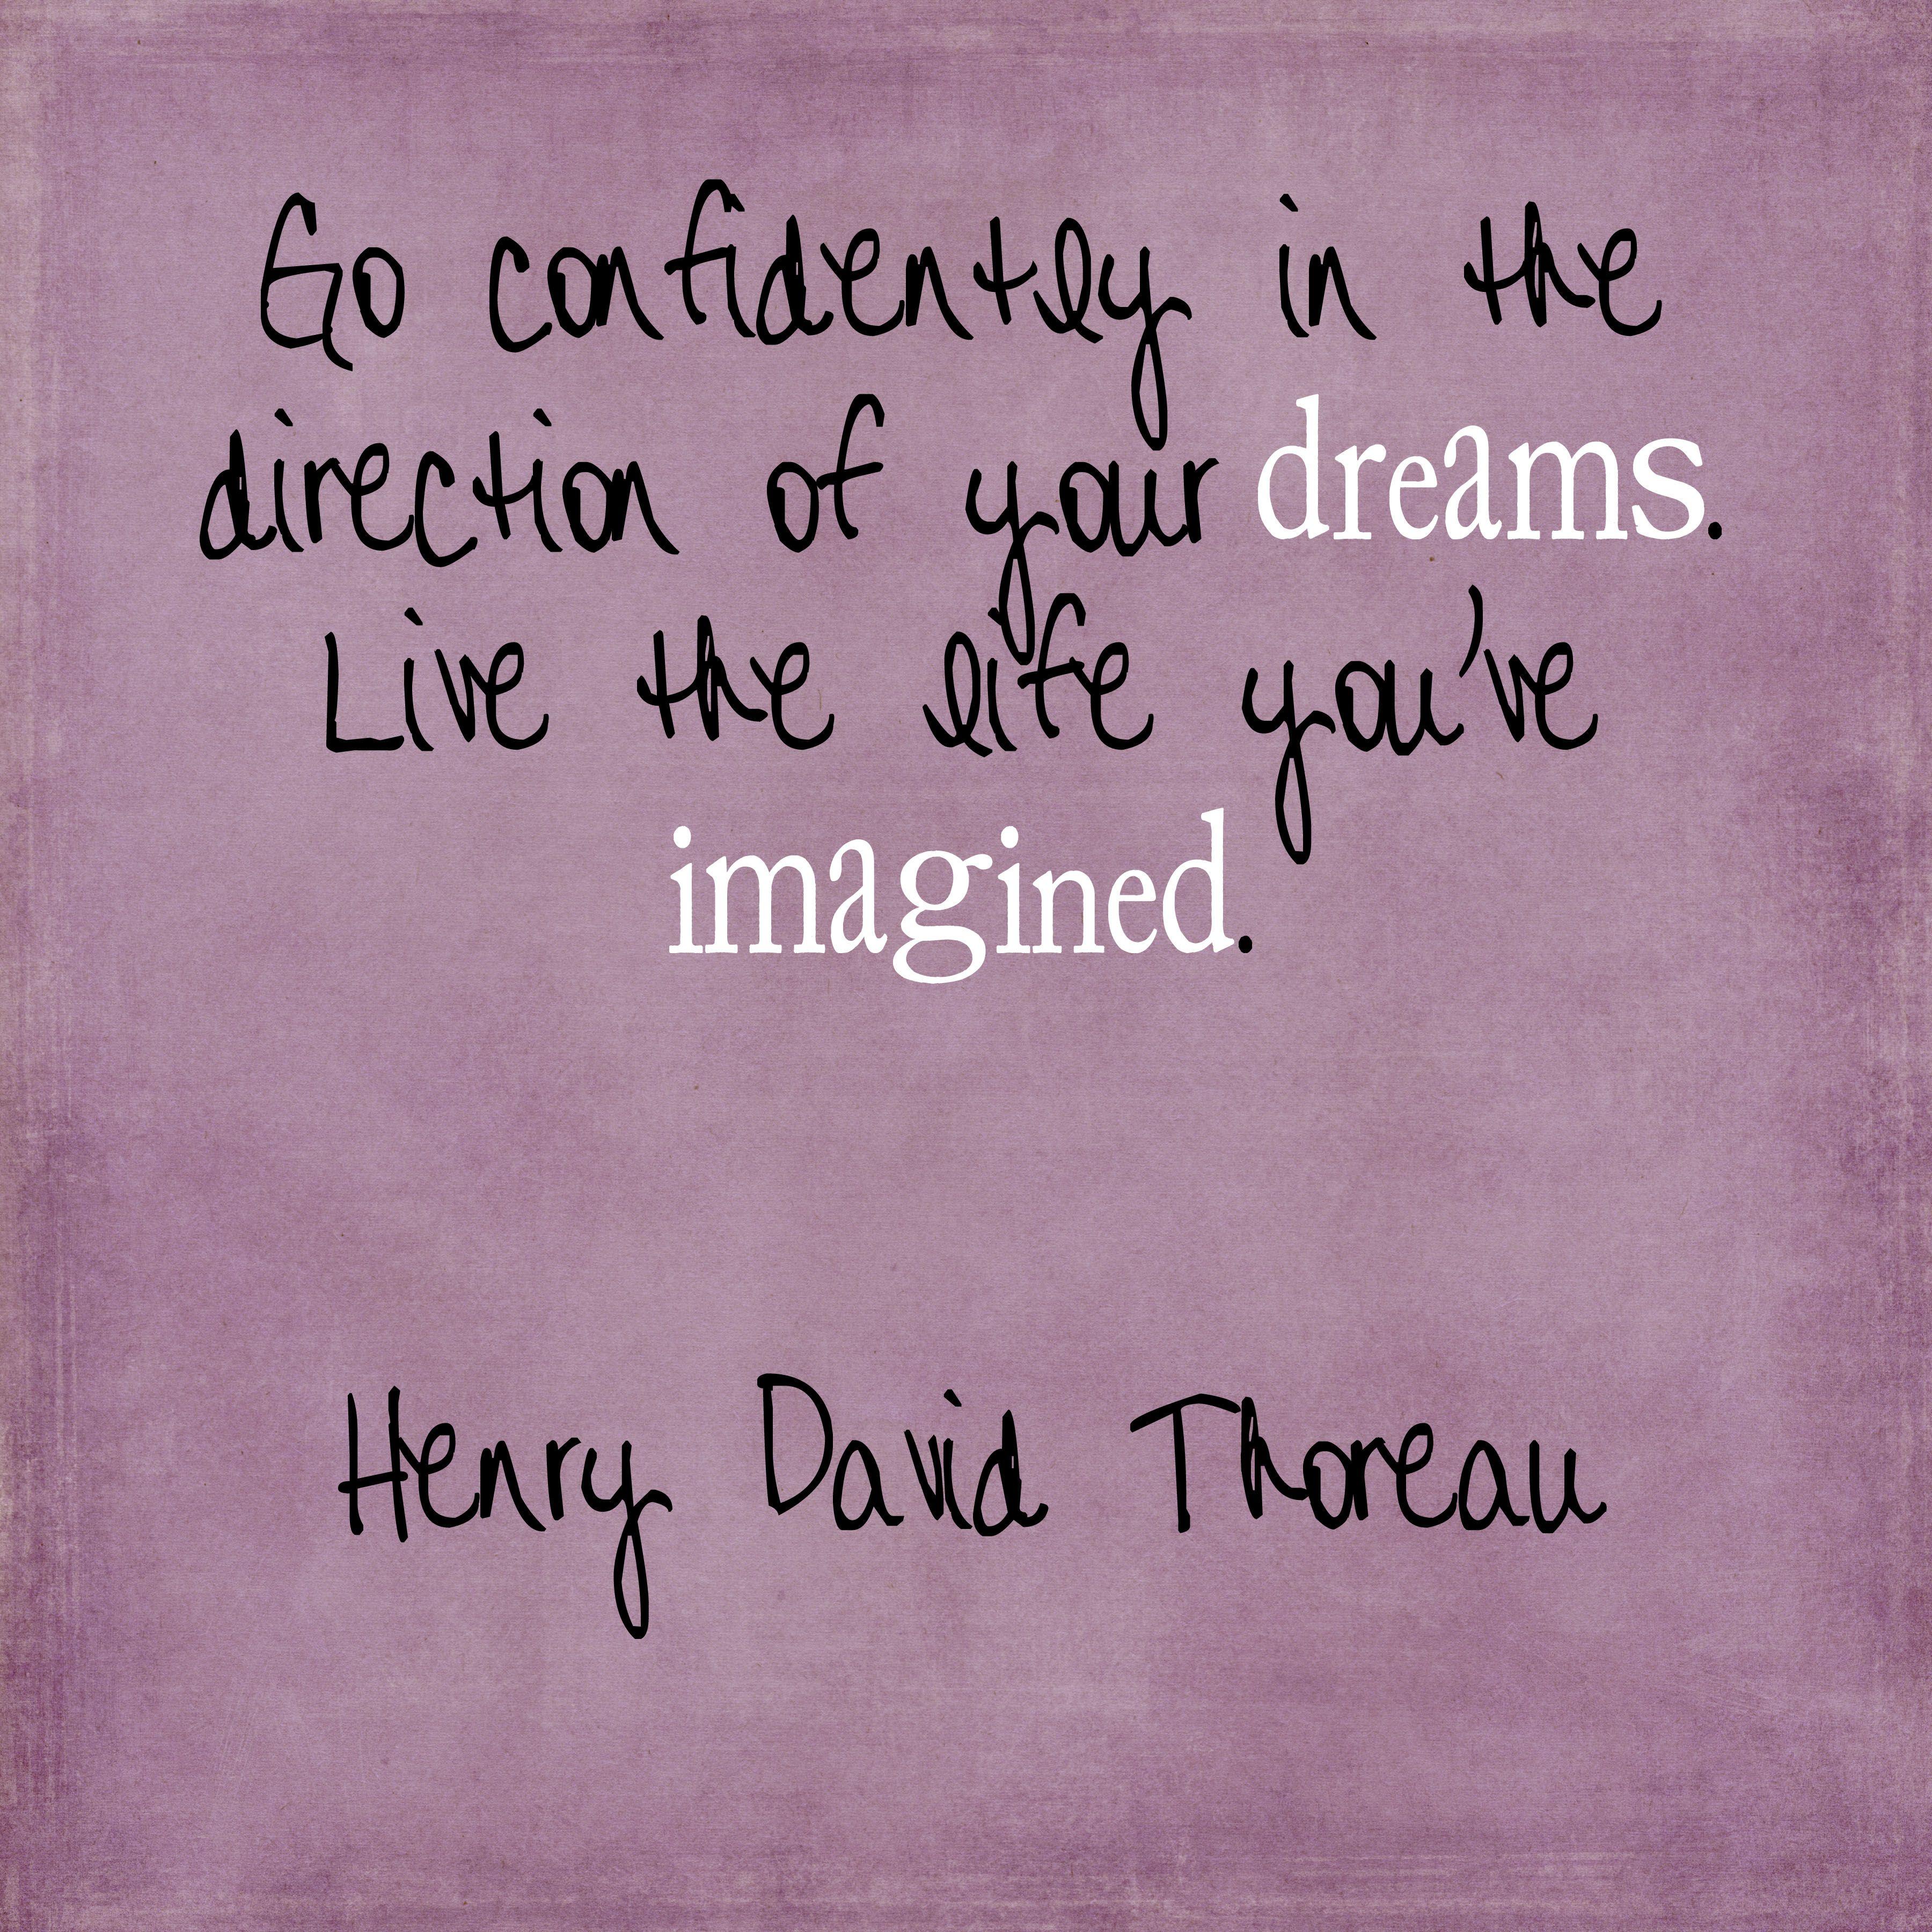 Favorite Quotation Thoreau  Quotes  Pinterest  Henry David Thoreau Wisdom And